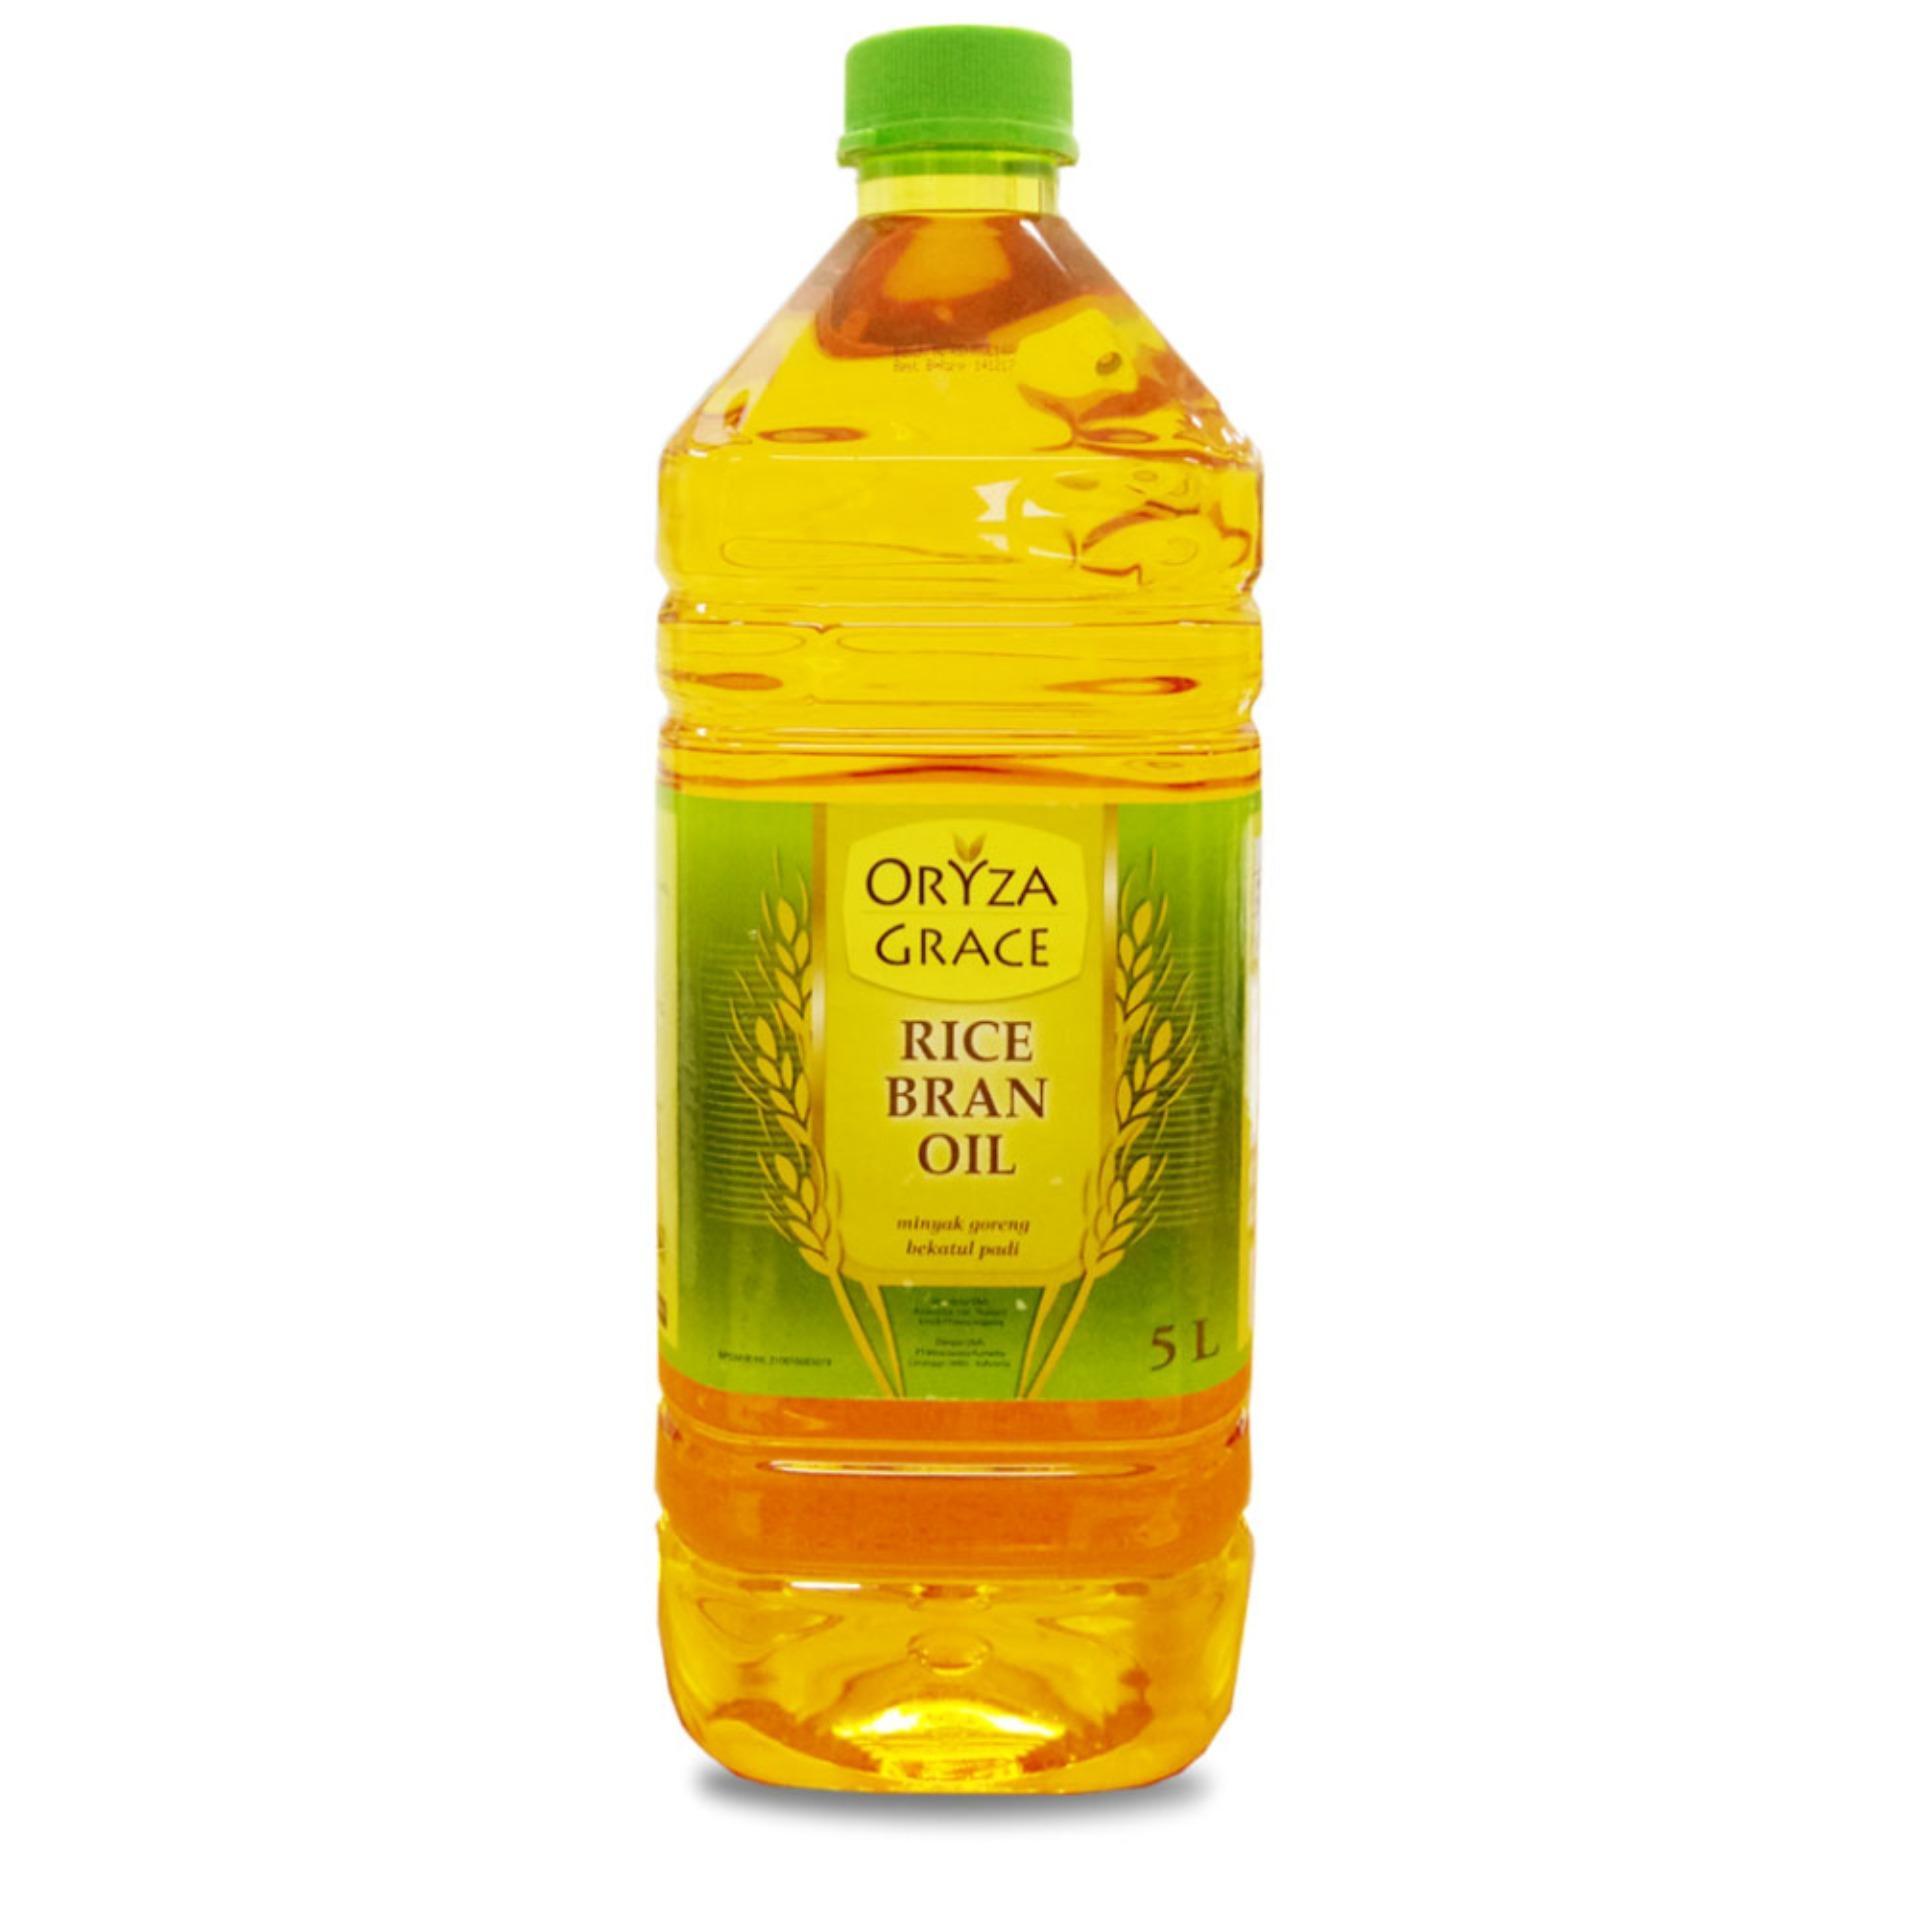 Jual Herba Bagoes Healthy Cooking Coconut Oil Minyak Goreng 1000 Ml Filma 2 L Pounch Oryza Grace Bekatul Padi Rice Bran 5